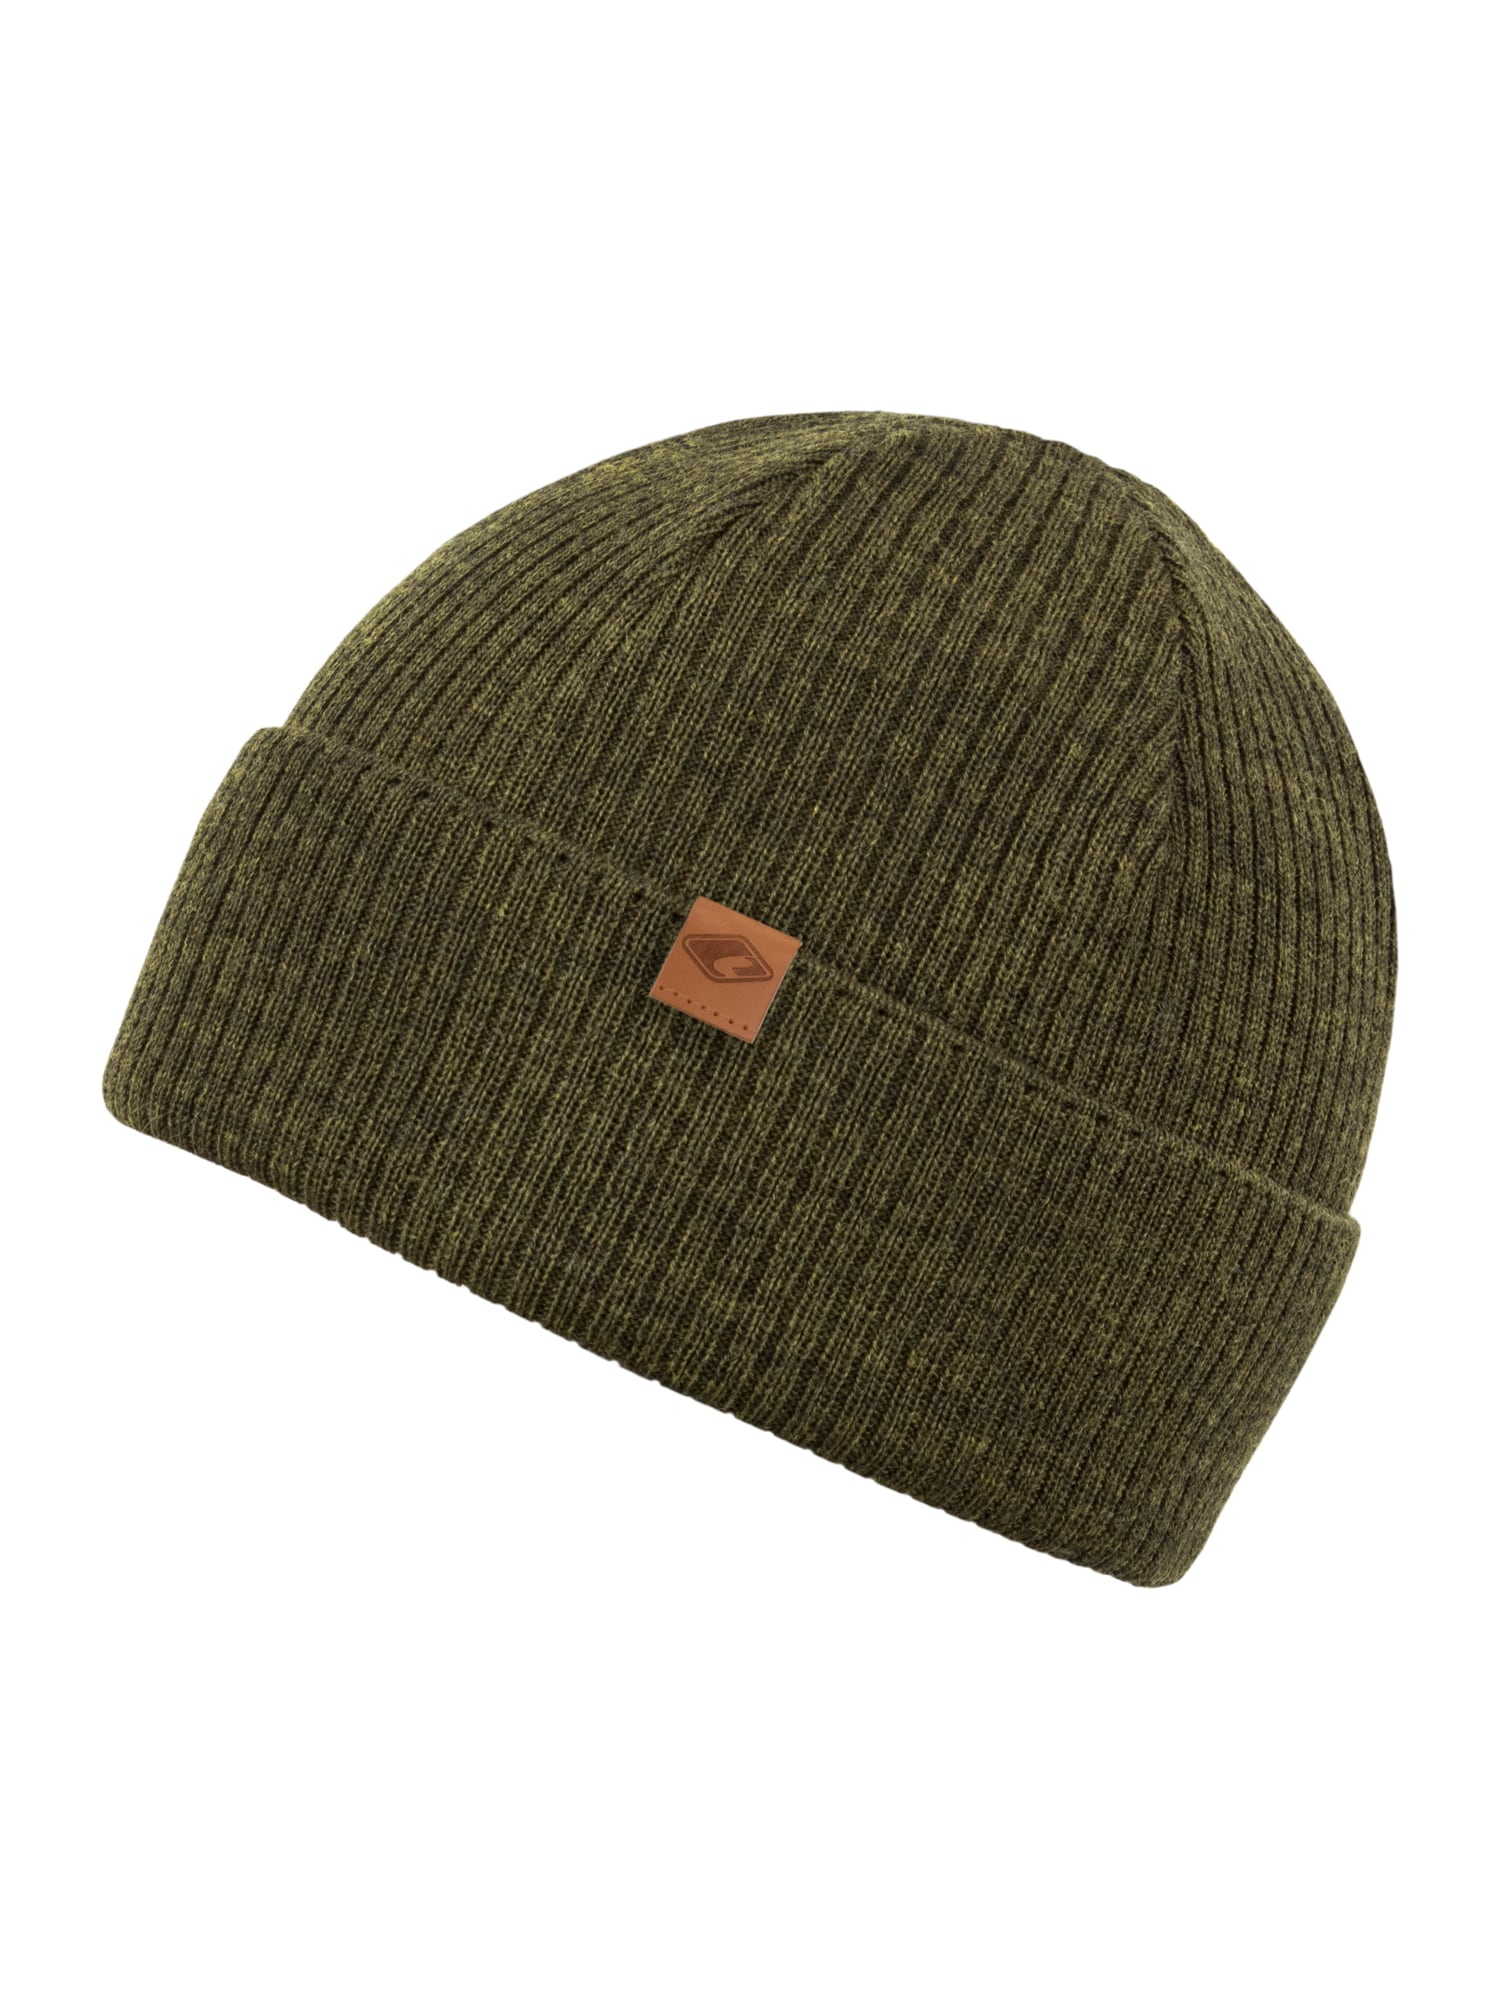 chillouts Megzta kepurė 'Dominik' tamsiai žalia